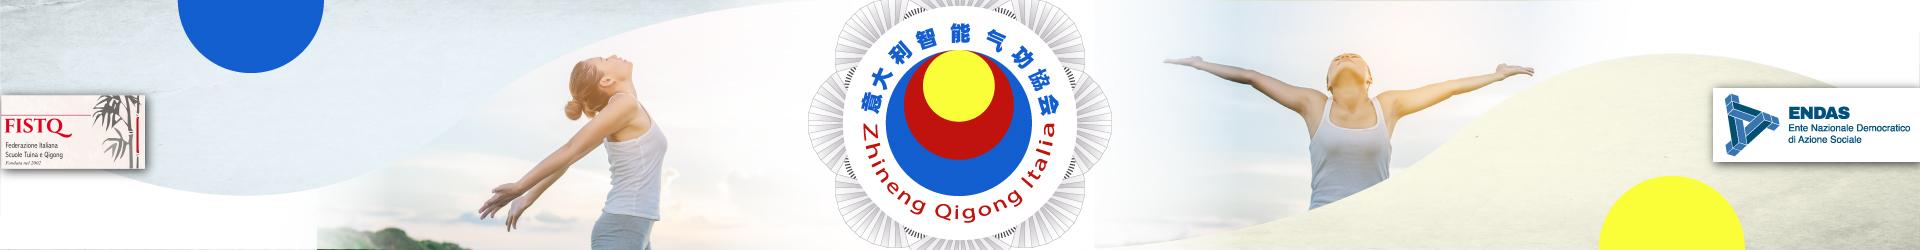 Associazione Sportiva Dilettantistica Zhineng Qi Gong Italia